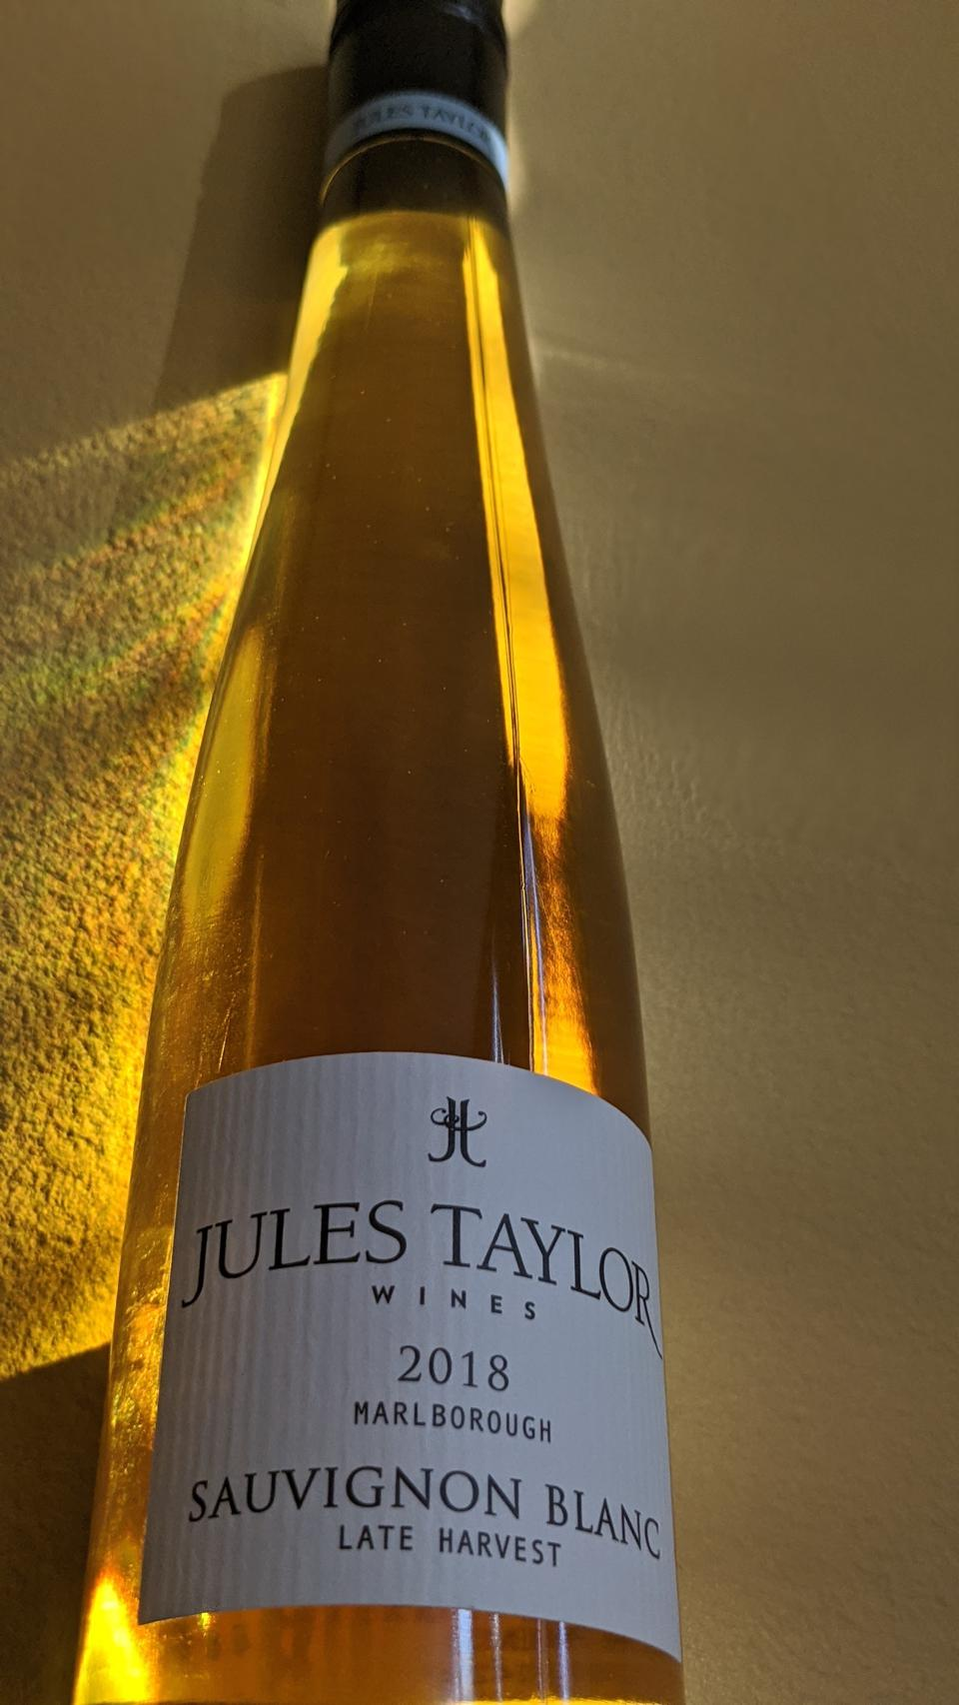 2018 Jules Taylor Late Harvest Sauvignon Blanc